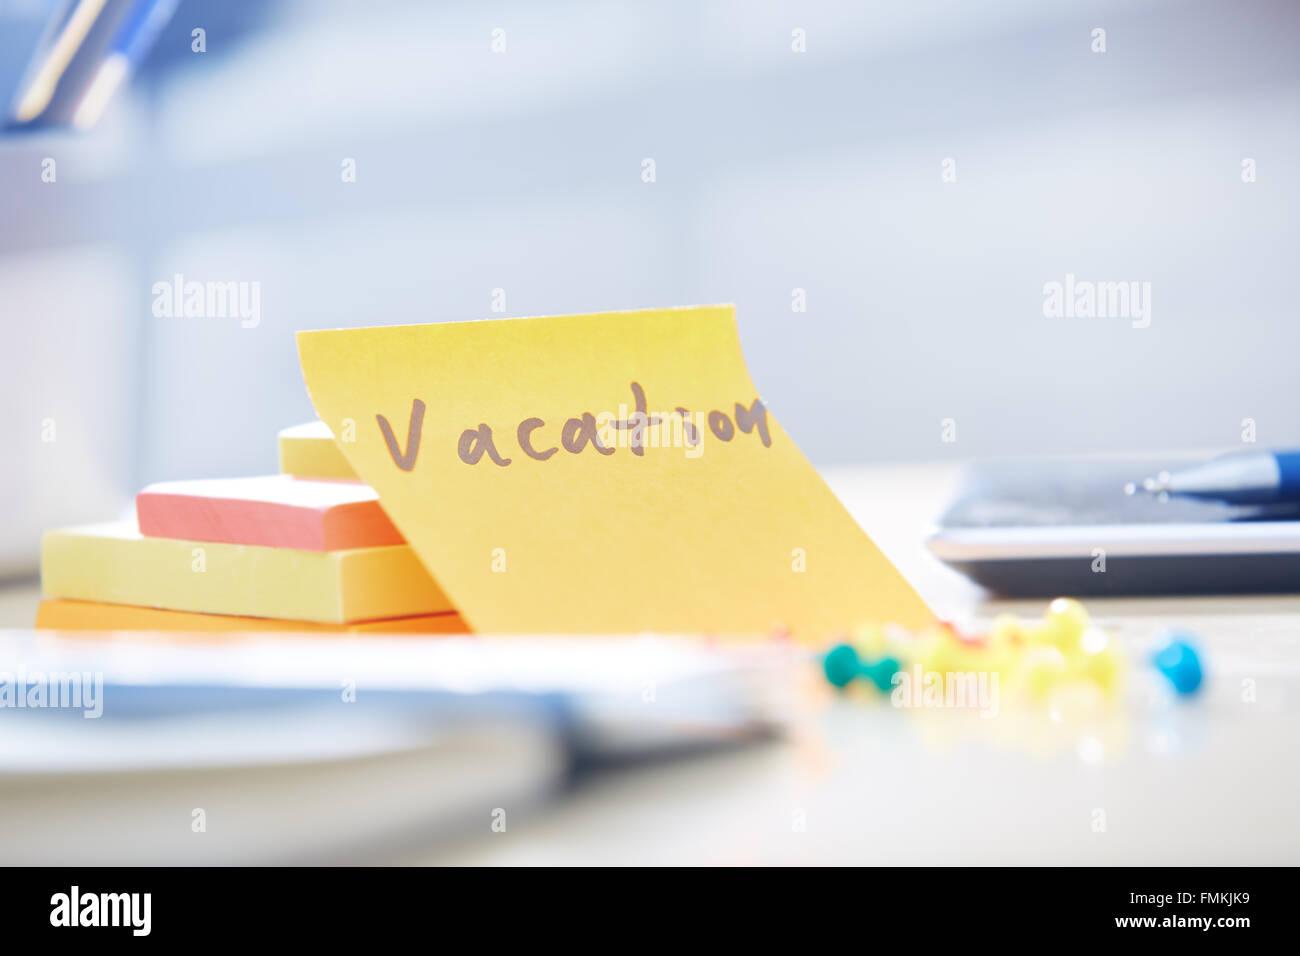 Urlaub-Text auf Klebstoff Hinweis im Büro Stockbild